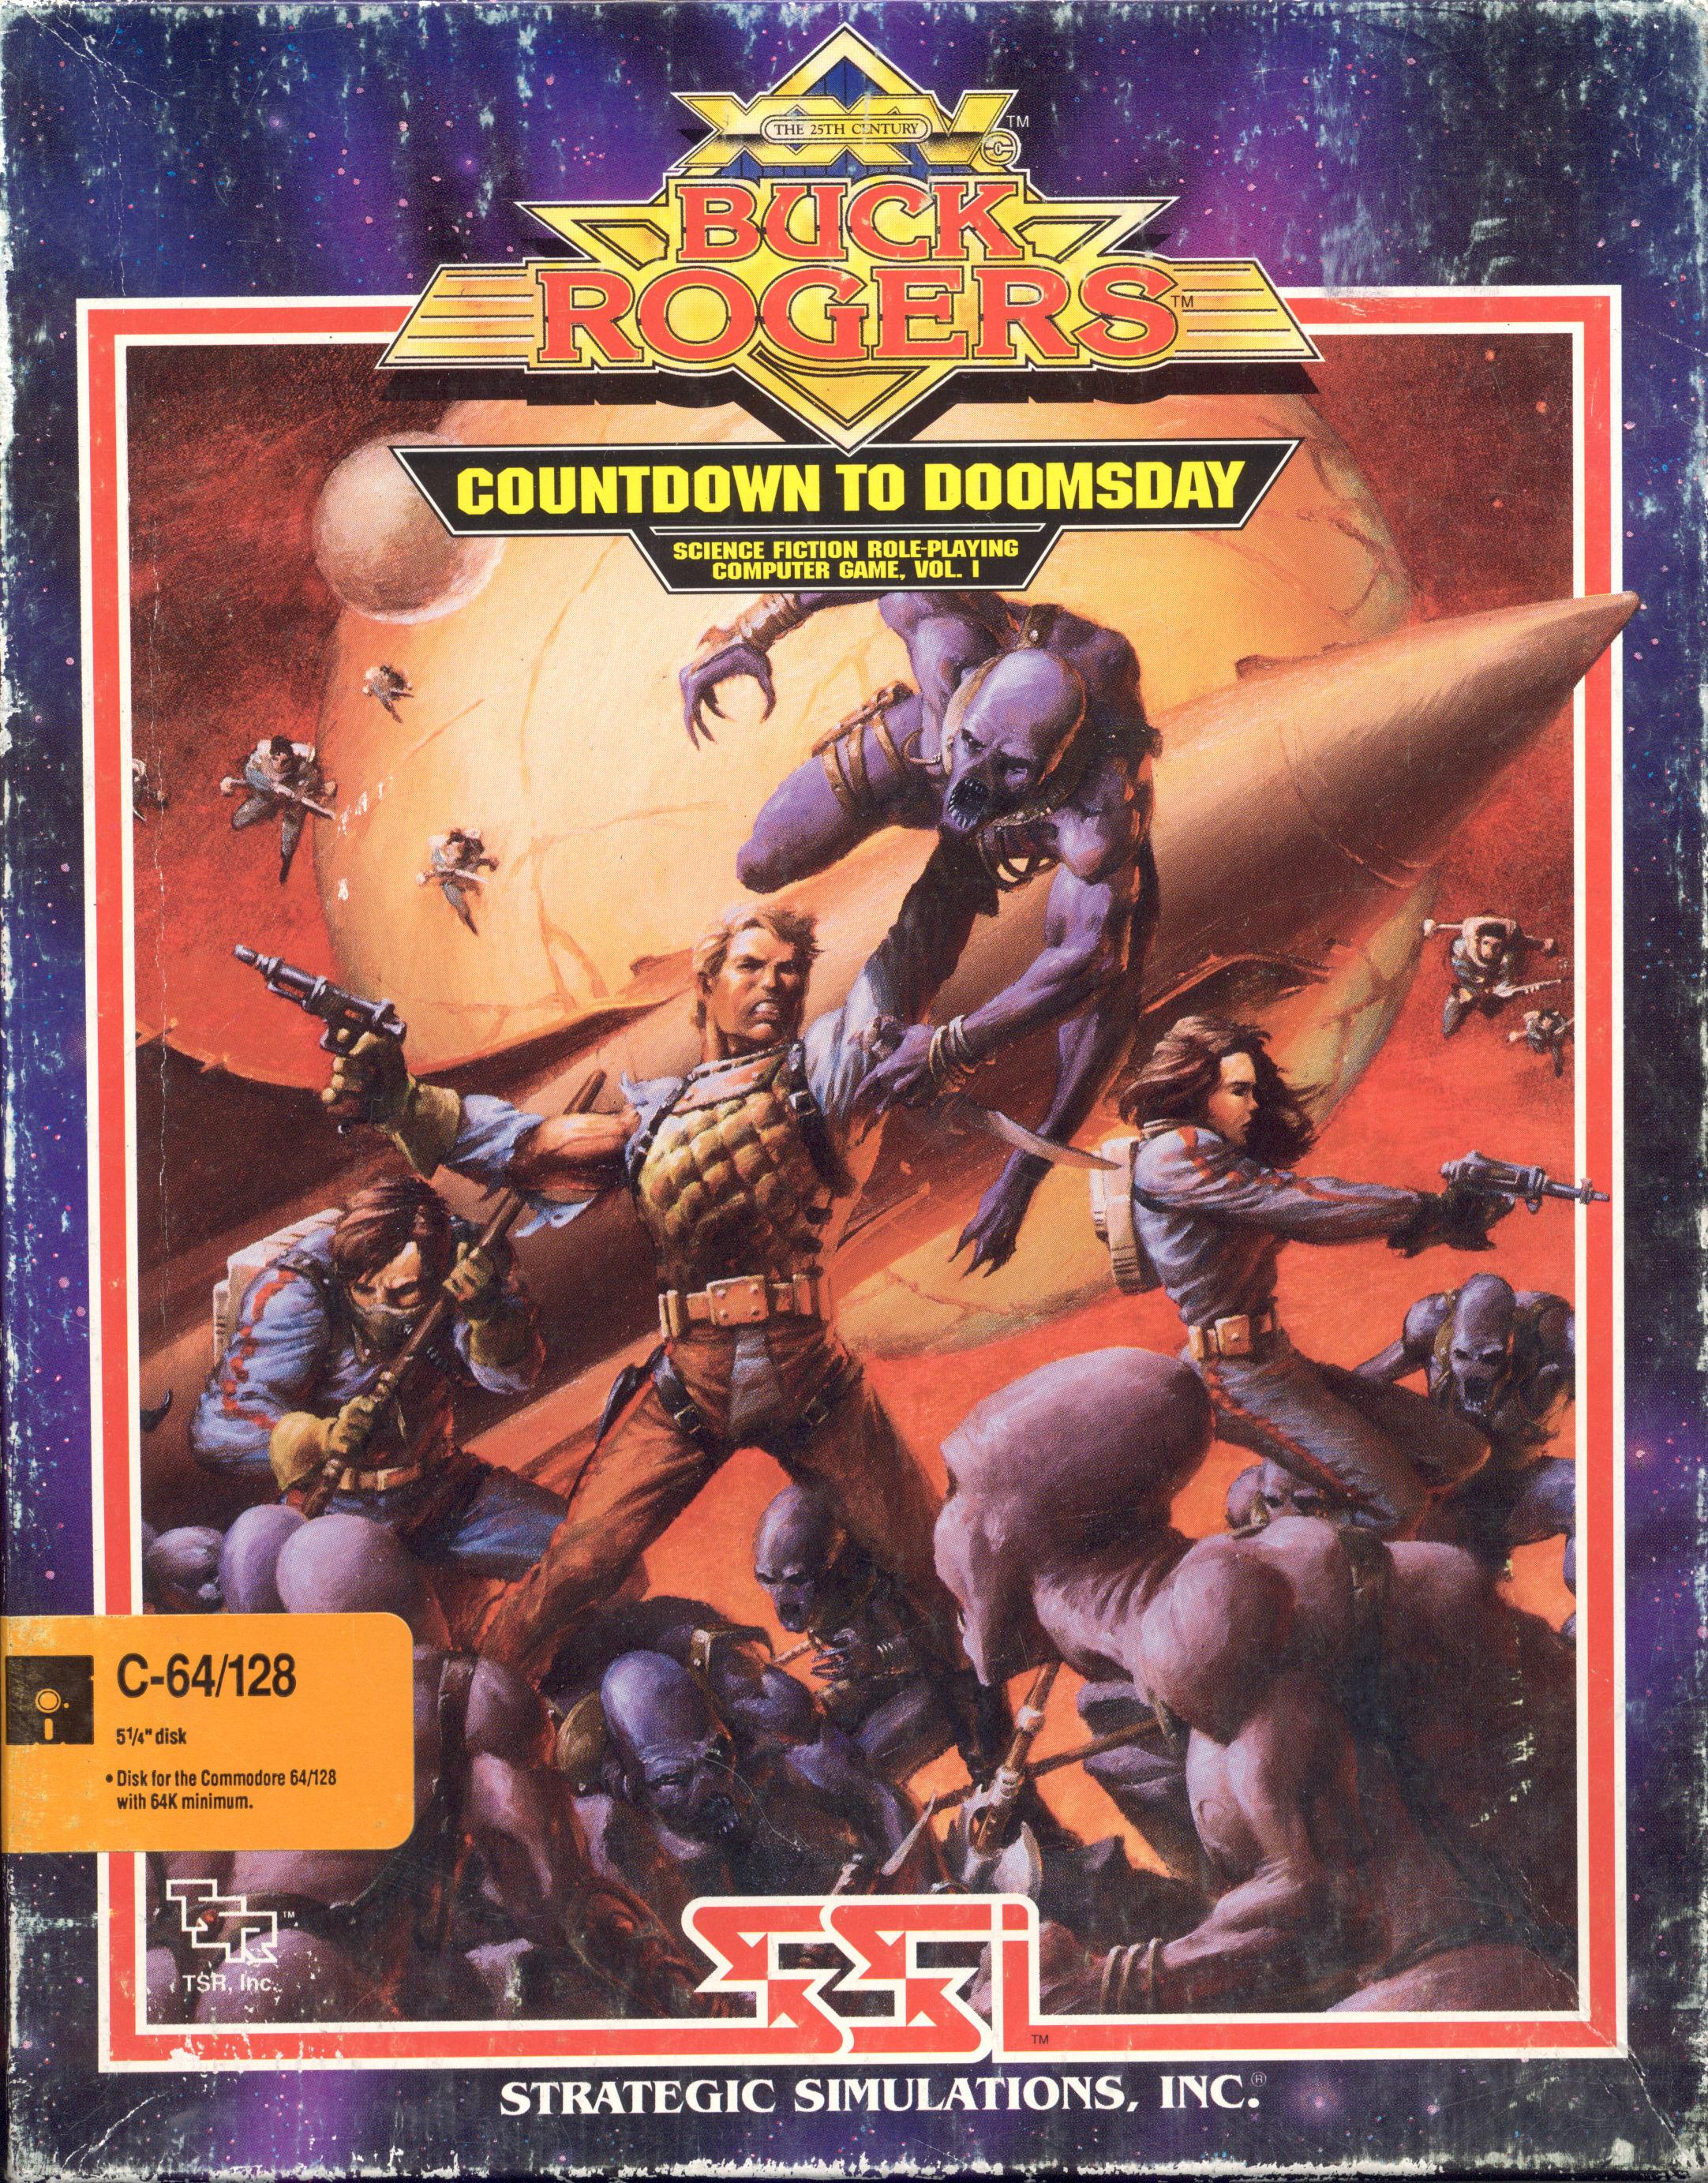 BuckRogersVol.1 CountdownToDoomsdaySSIDiskInlay01 - Retro Gallery Archive (Full Size)